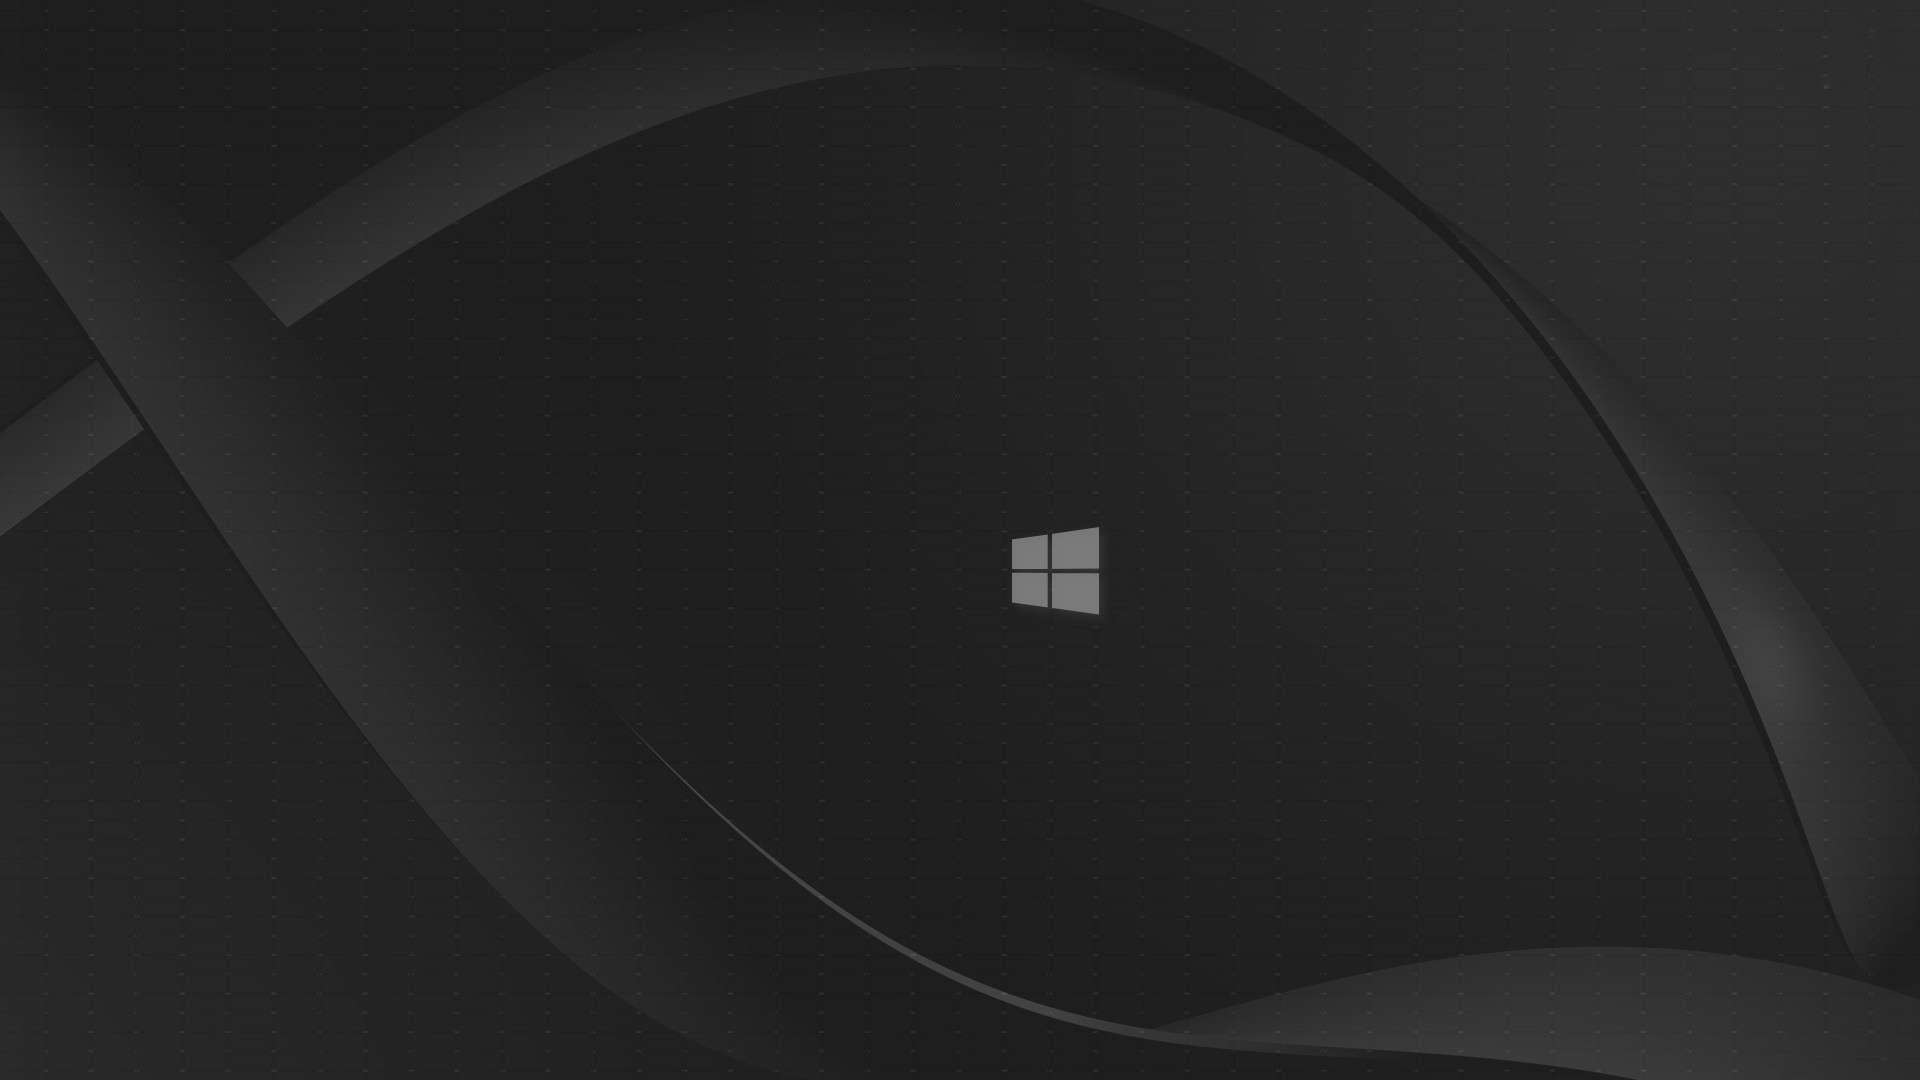 Windows 8 wallpaper hd 1080p black